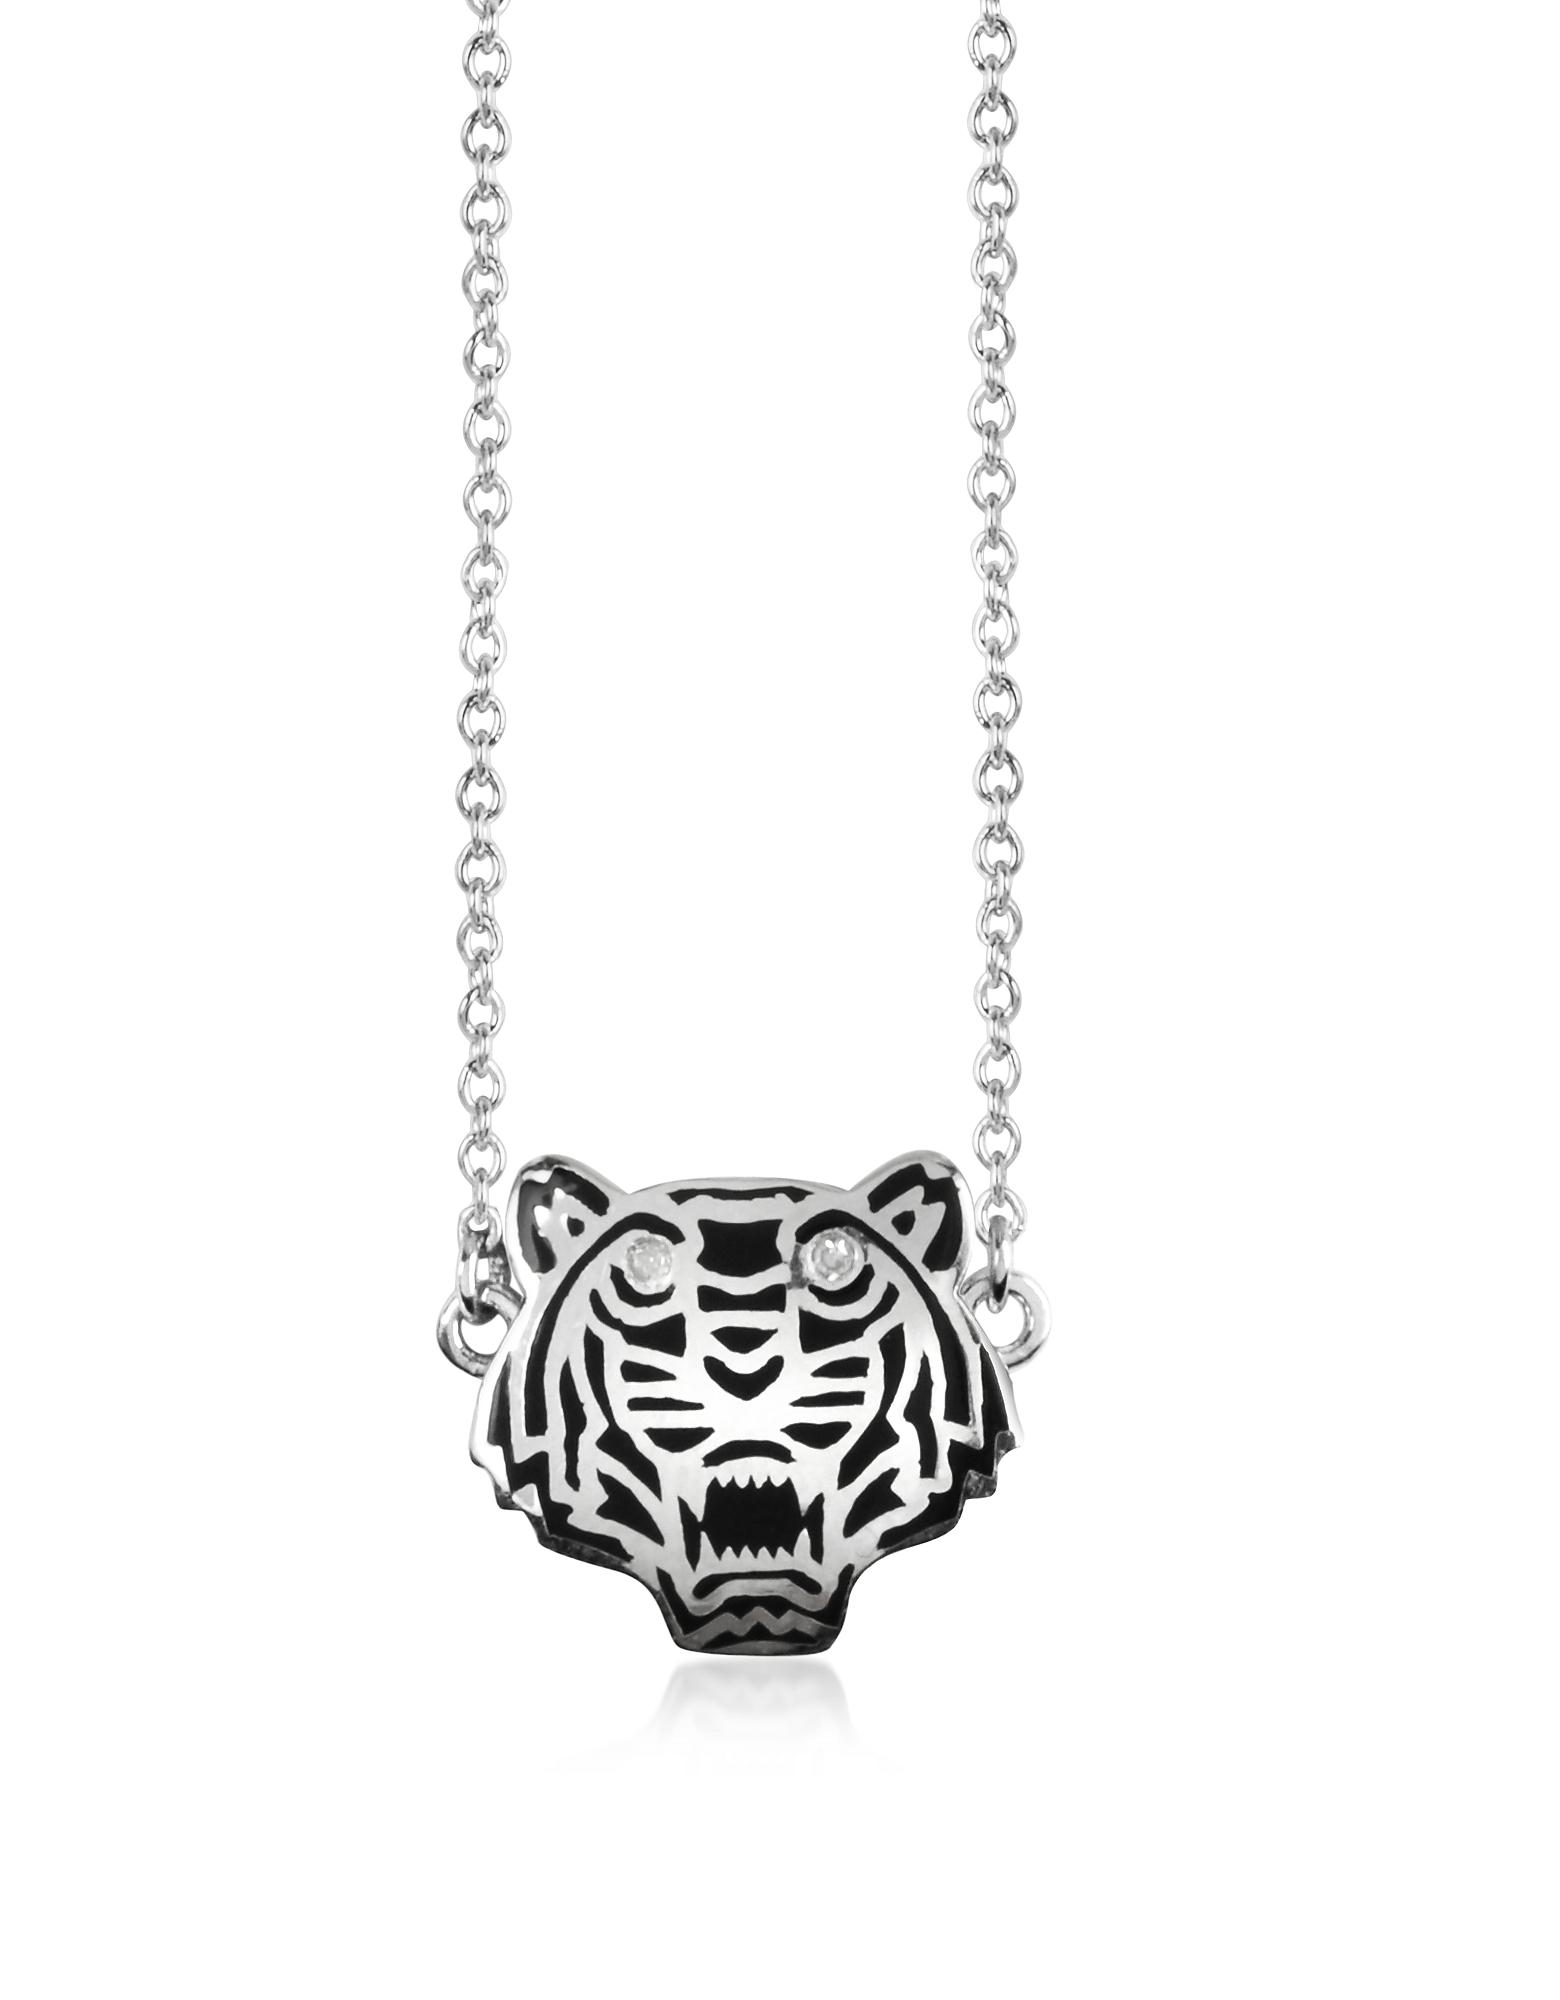 Mini Tiger - Ожерелье из Серебра 925 пробы с Маленьким Тигром